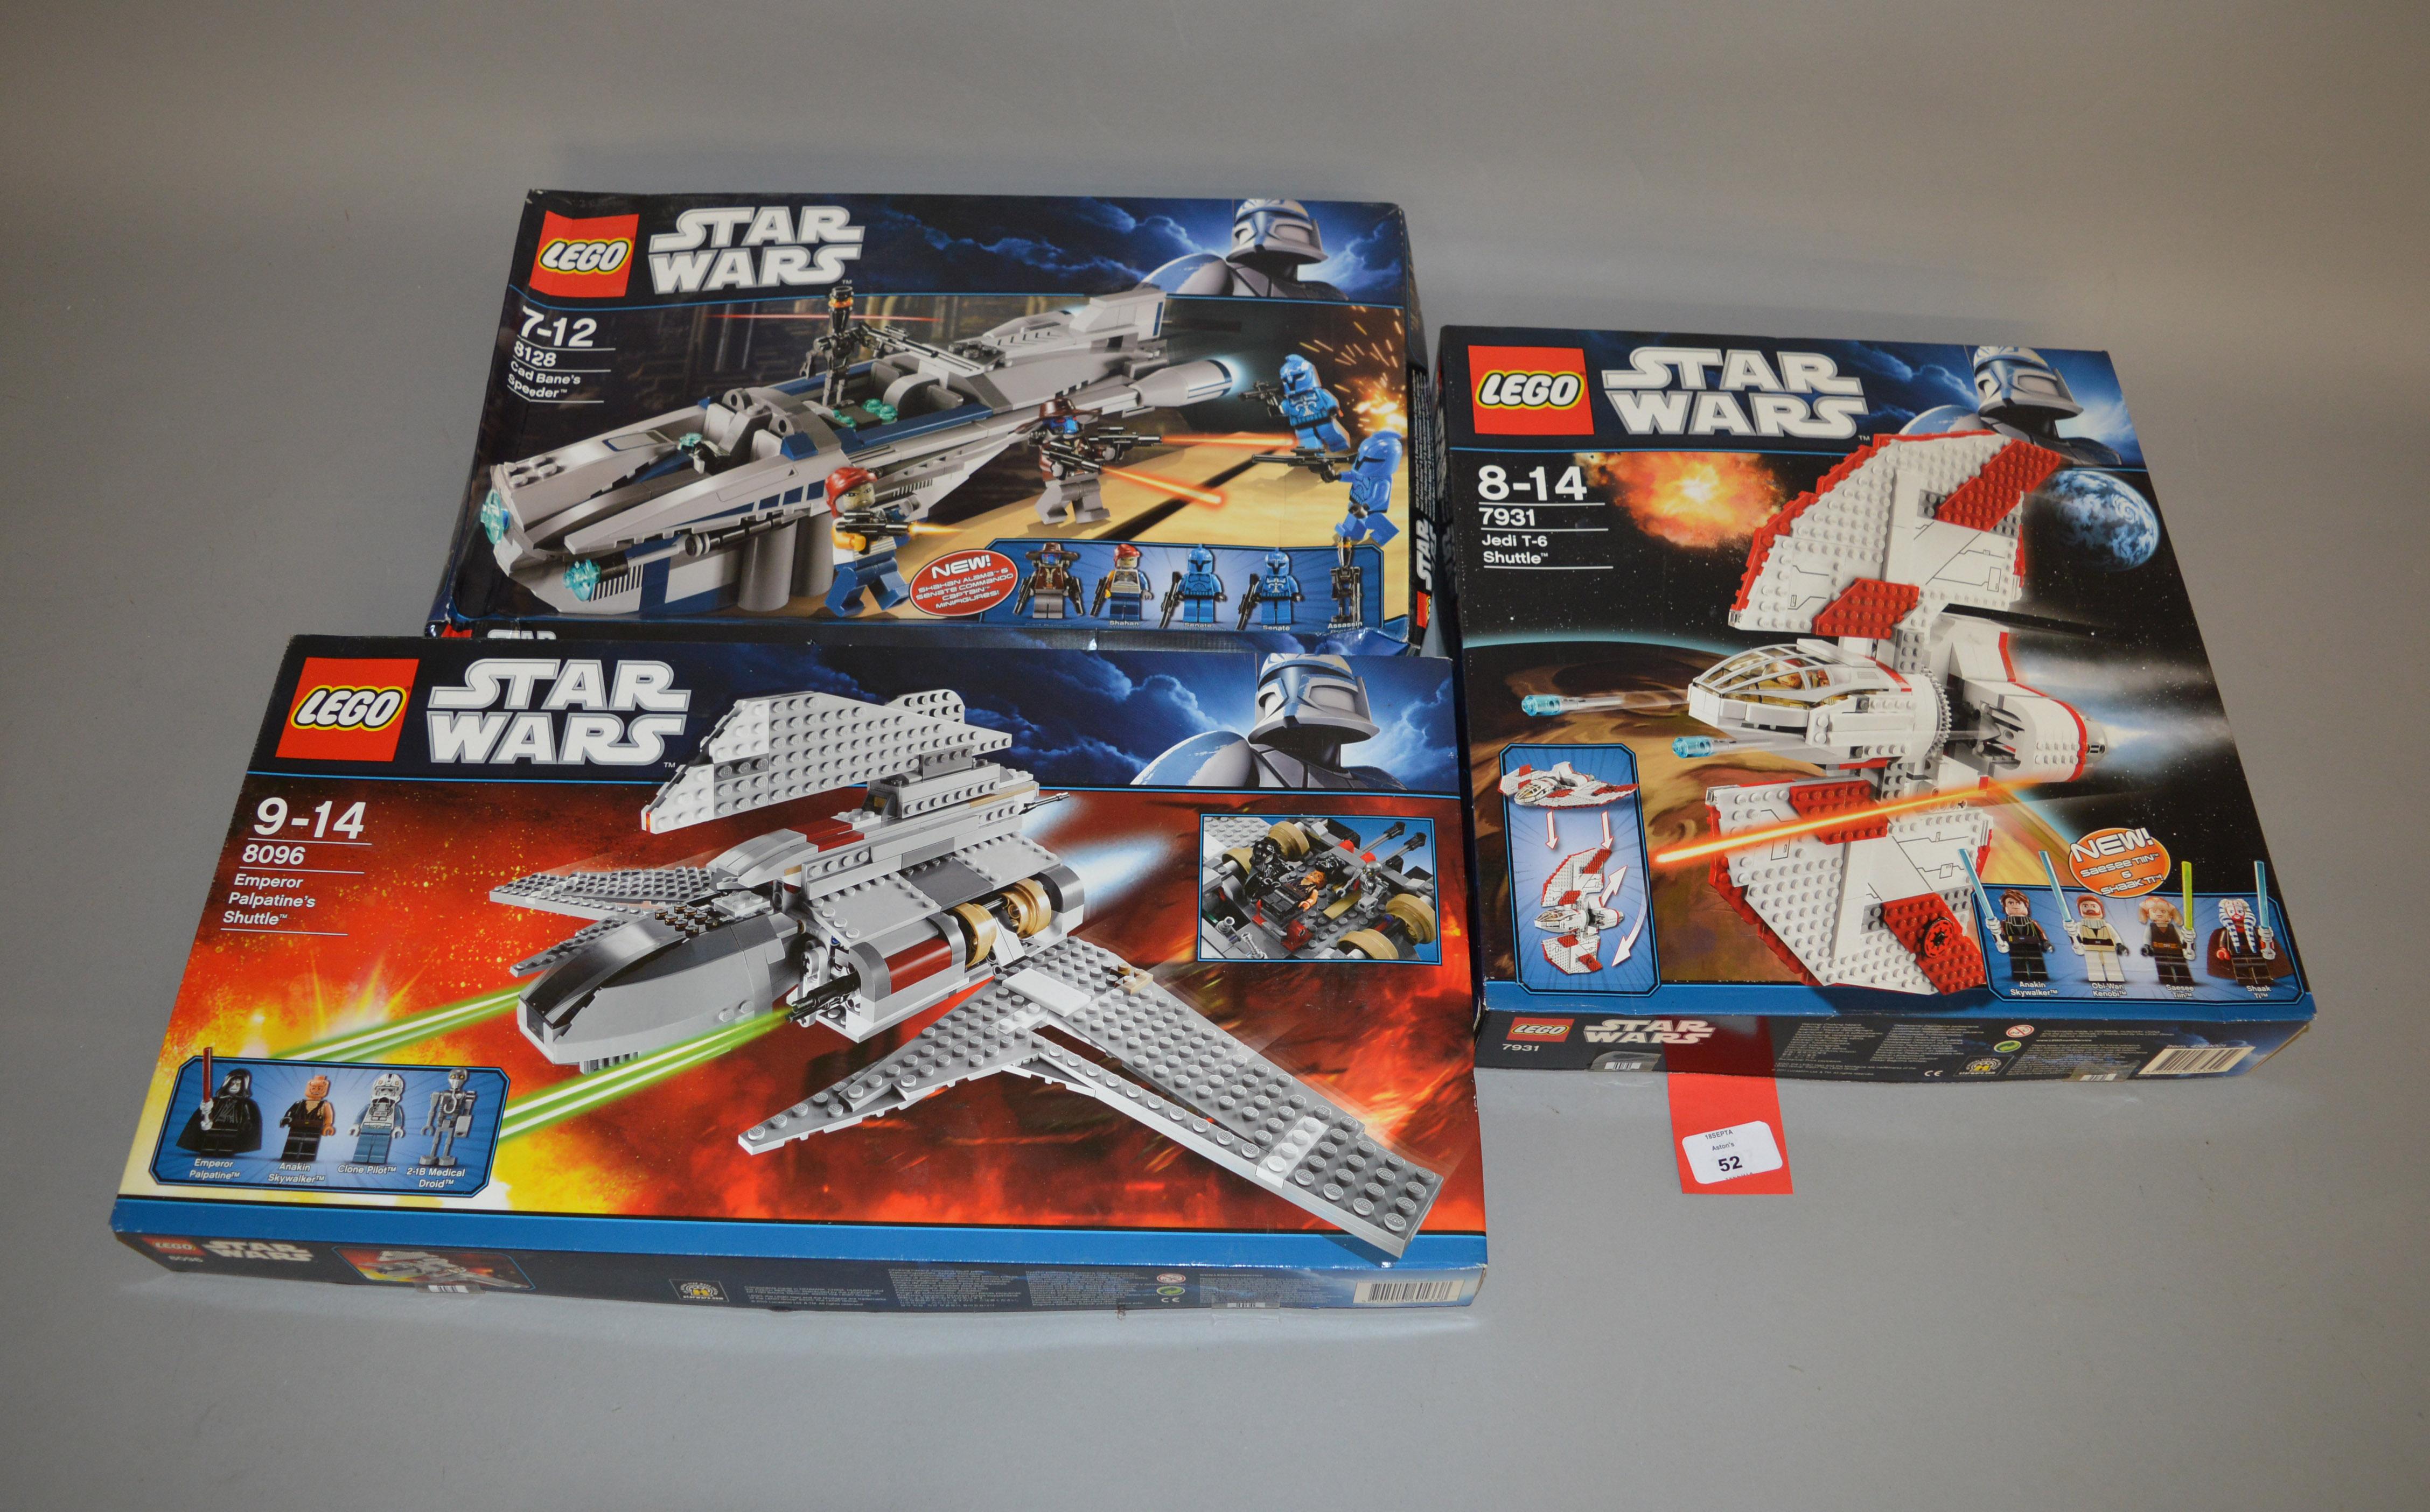 Lot 52 - Three Lego Star Wars sets: 8096 Emperor Palpatine's Shuttle; 7931 Jedi T-6 Shuttle;